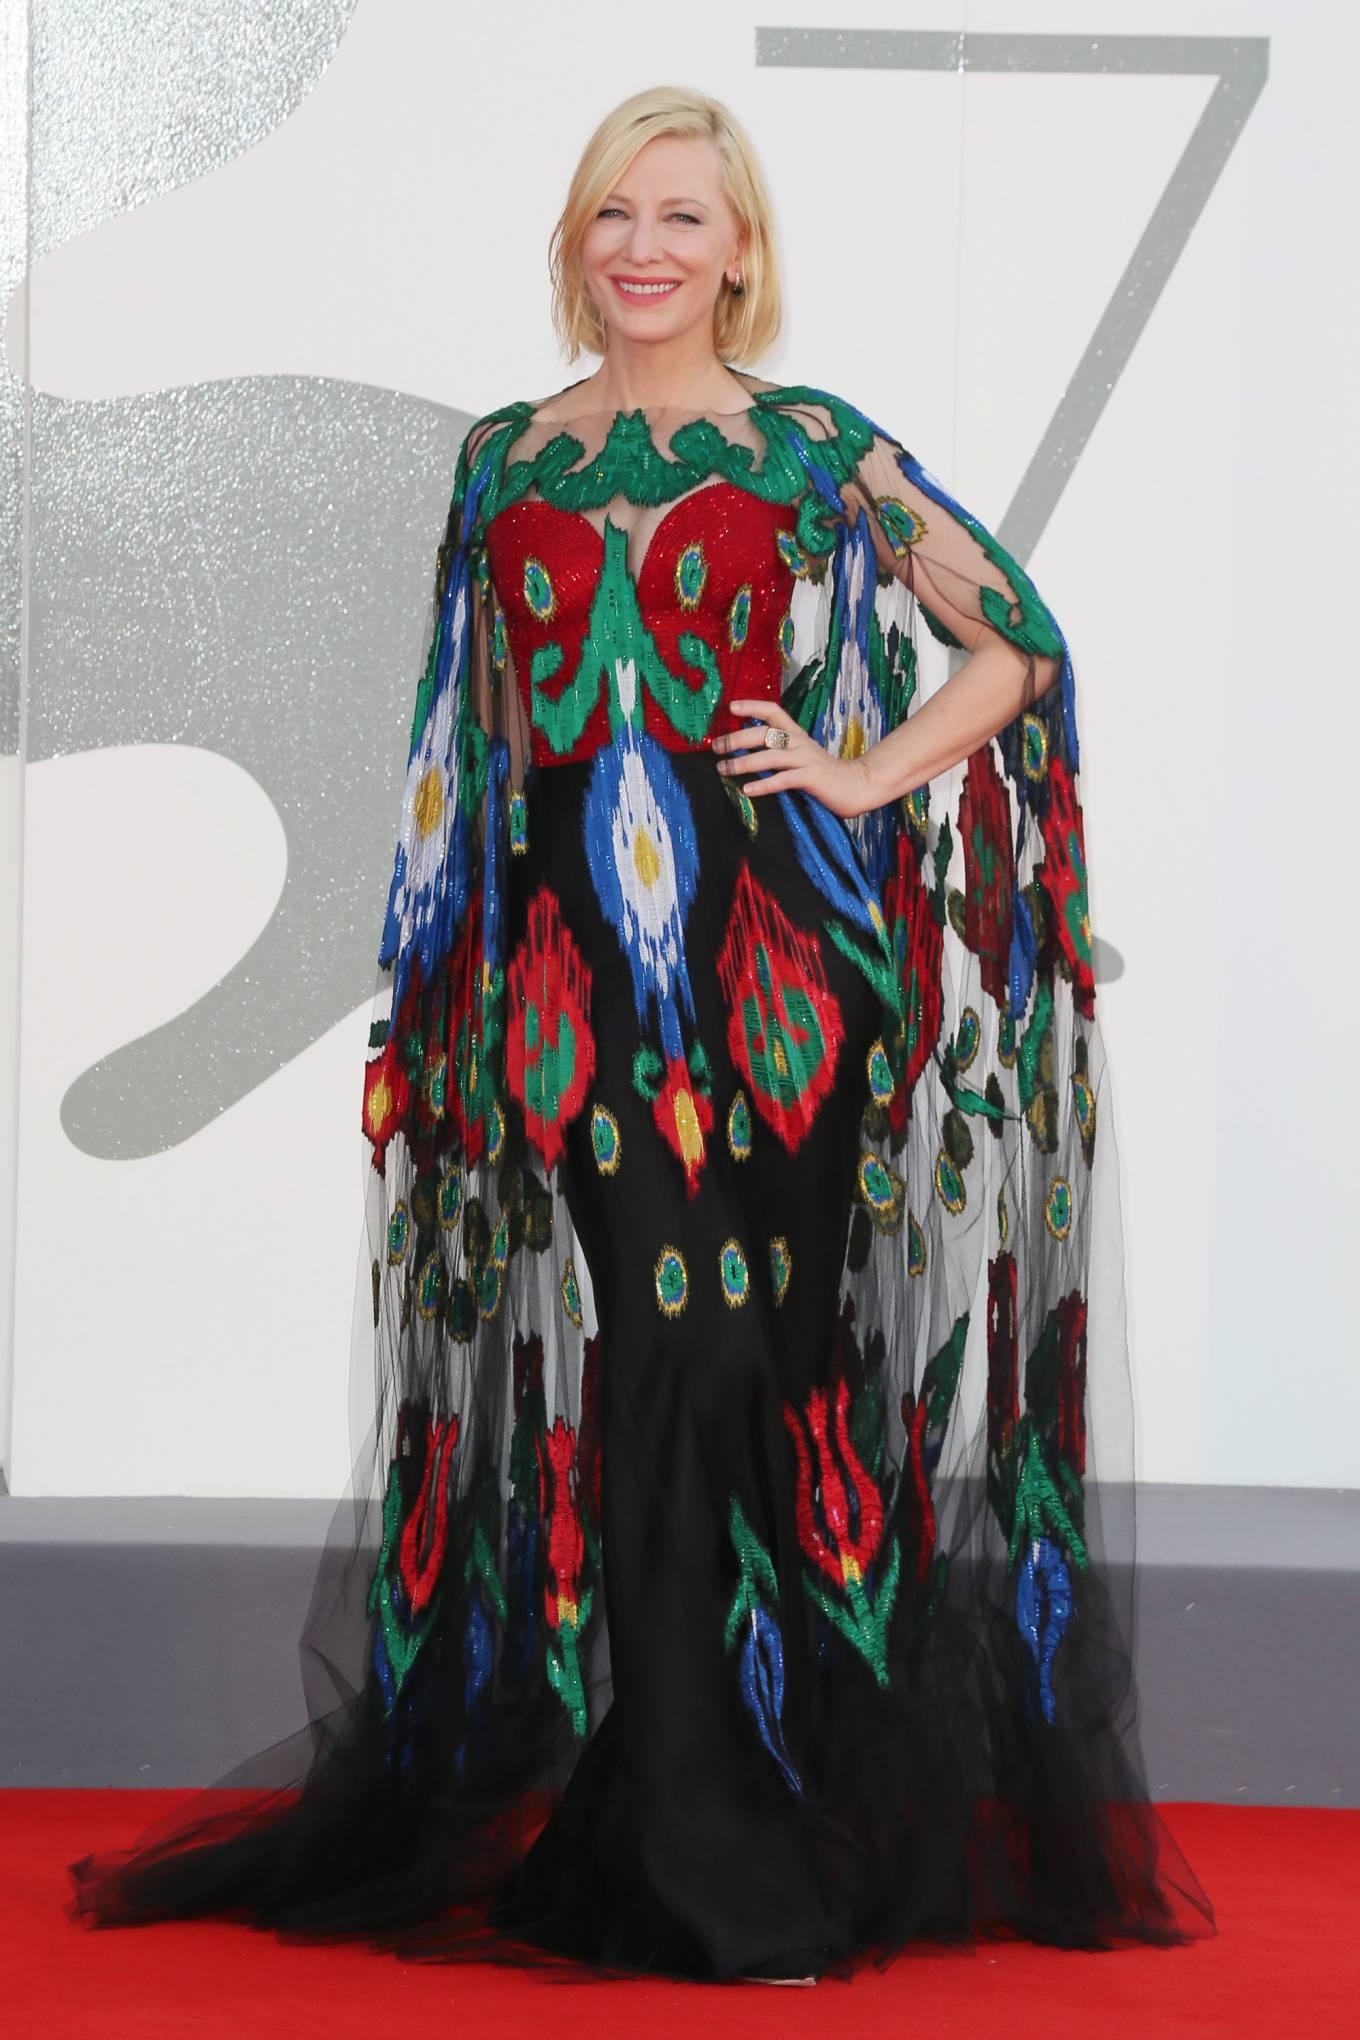 Cate Blanchett 2020 : Cate Blanchett – Closing Ceremony Red Carpet of 2020 Venice Film Festival in Venice-08